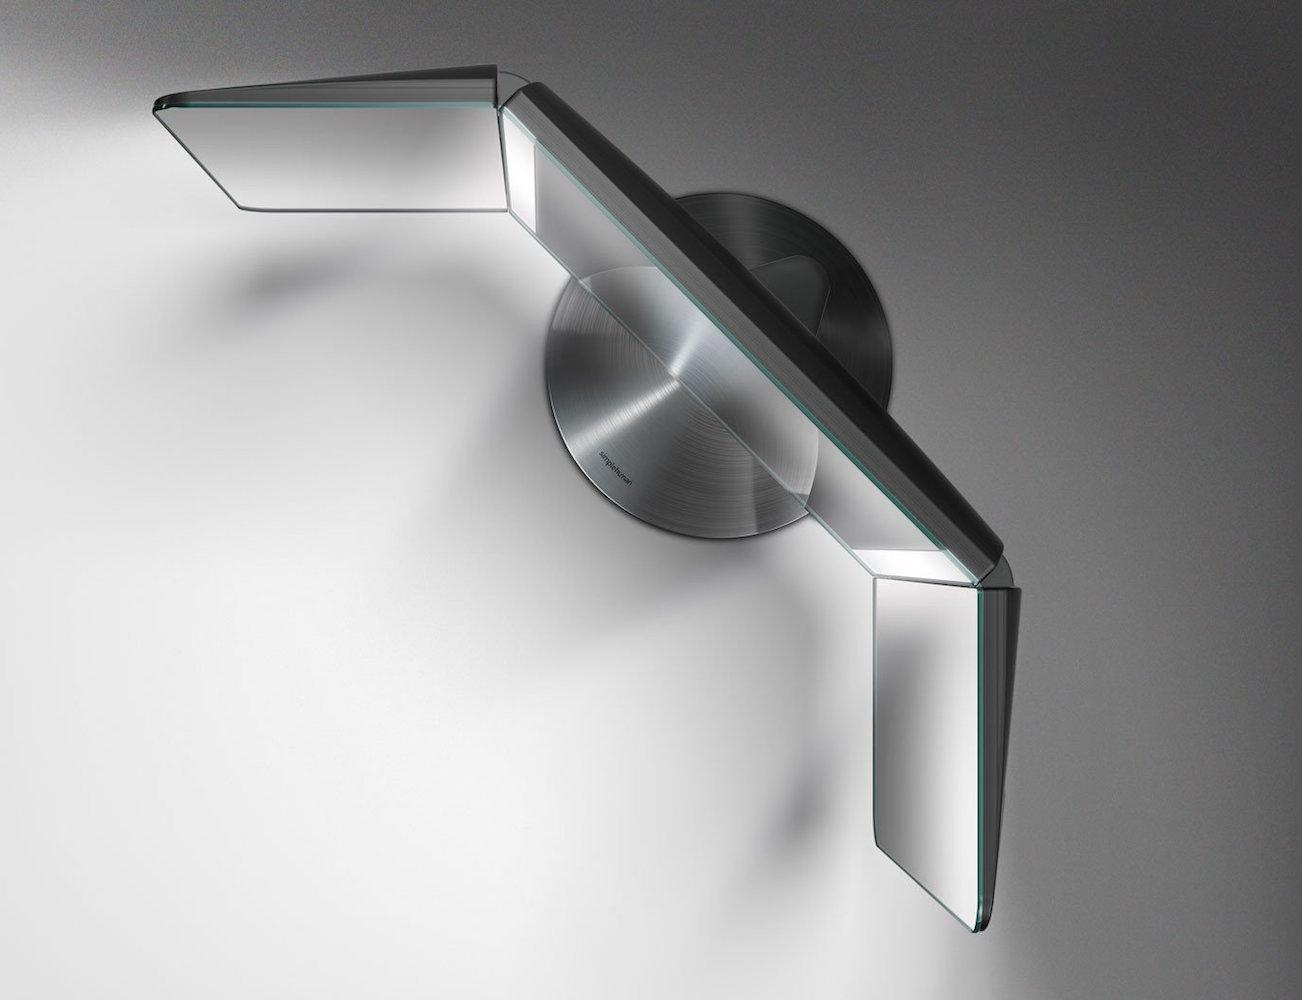 Wide View Sensor Mirror By Simplehuman 187 Gadget Flow